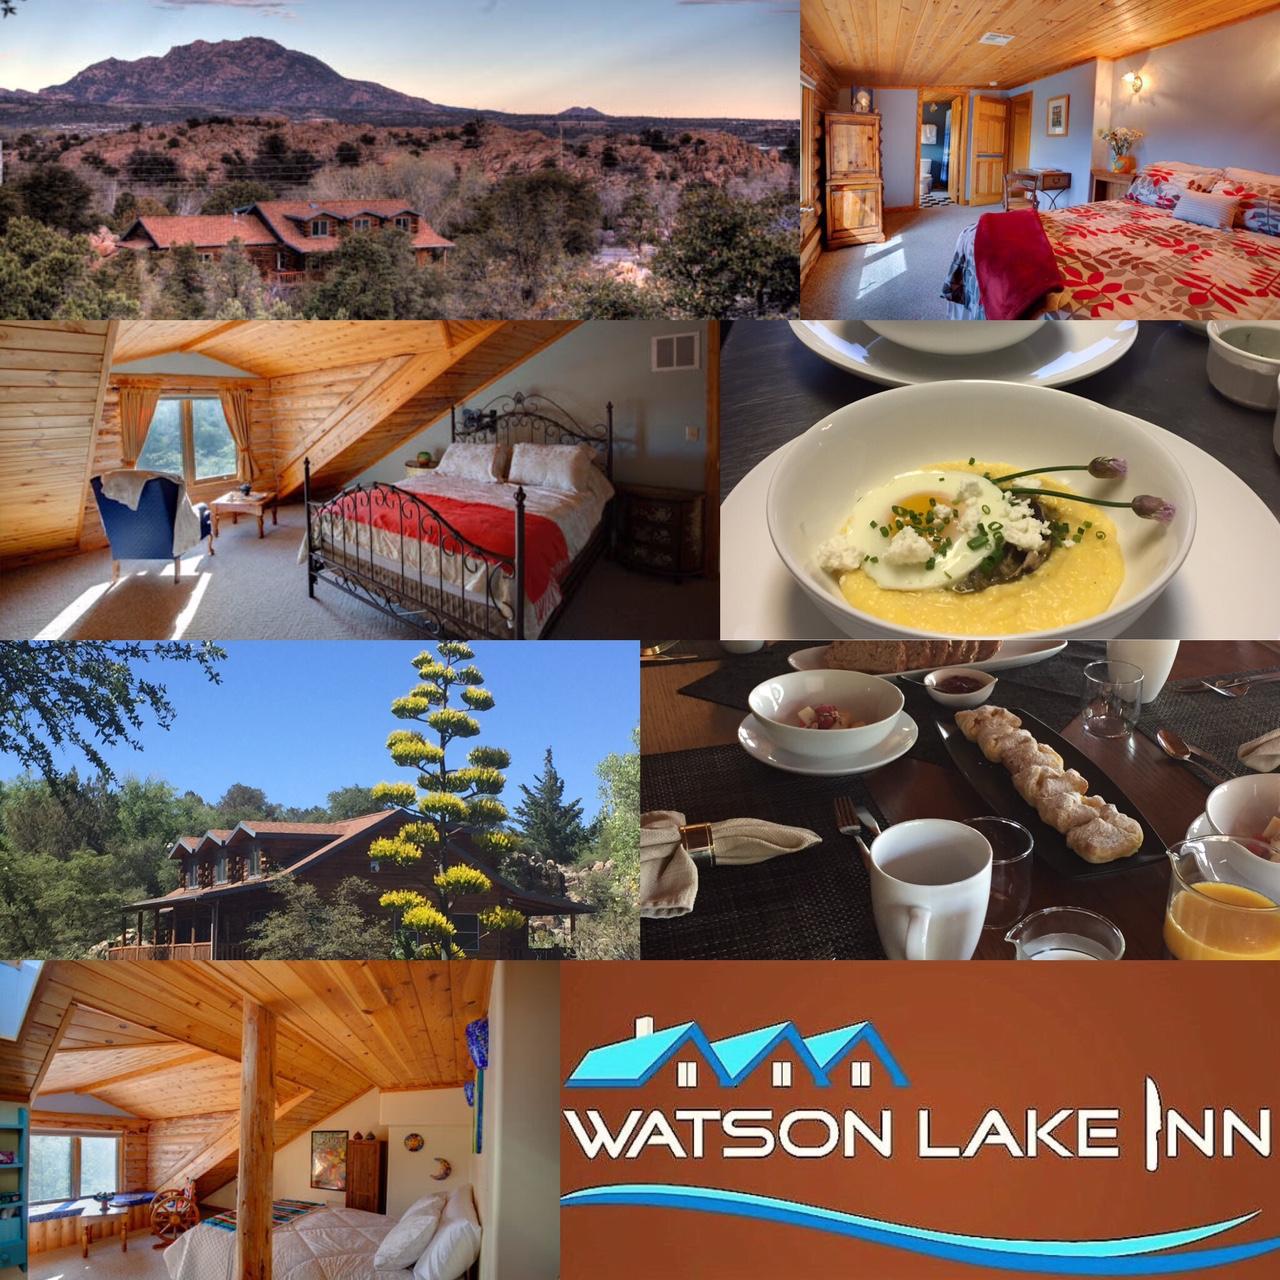 Watson Lake Inn bed and breakfast culinary school Prescott aZ